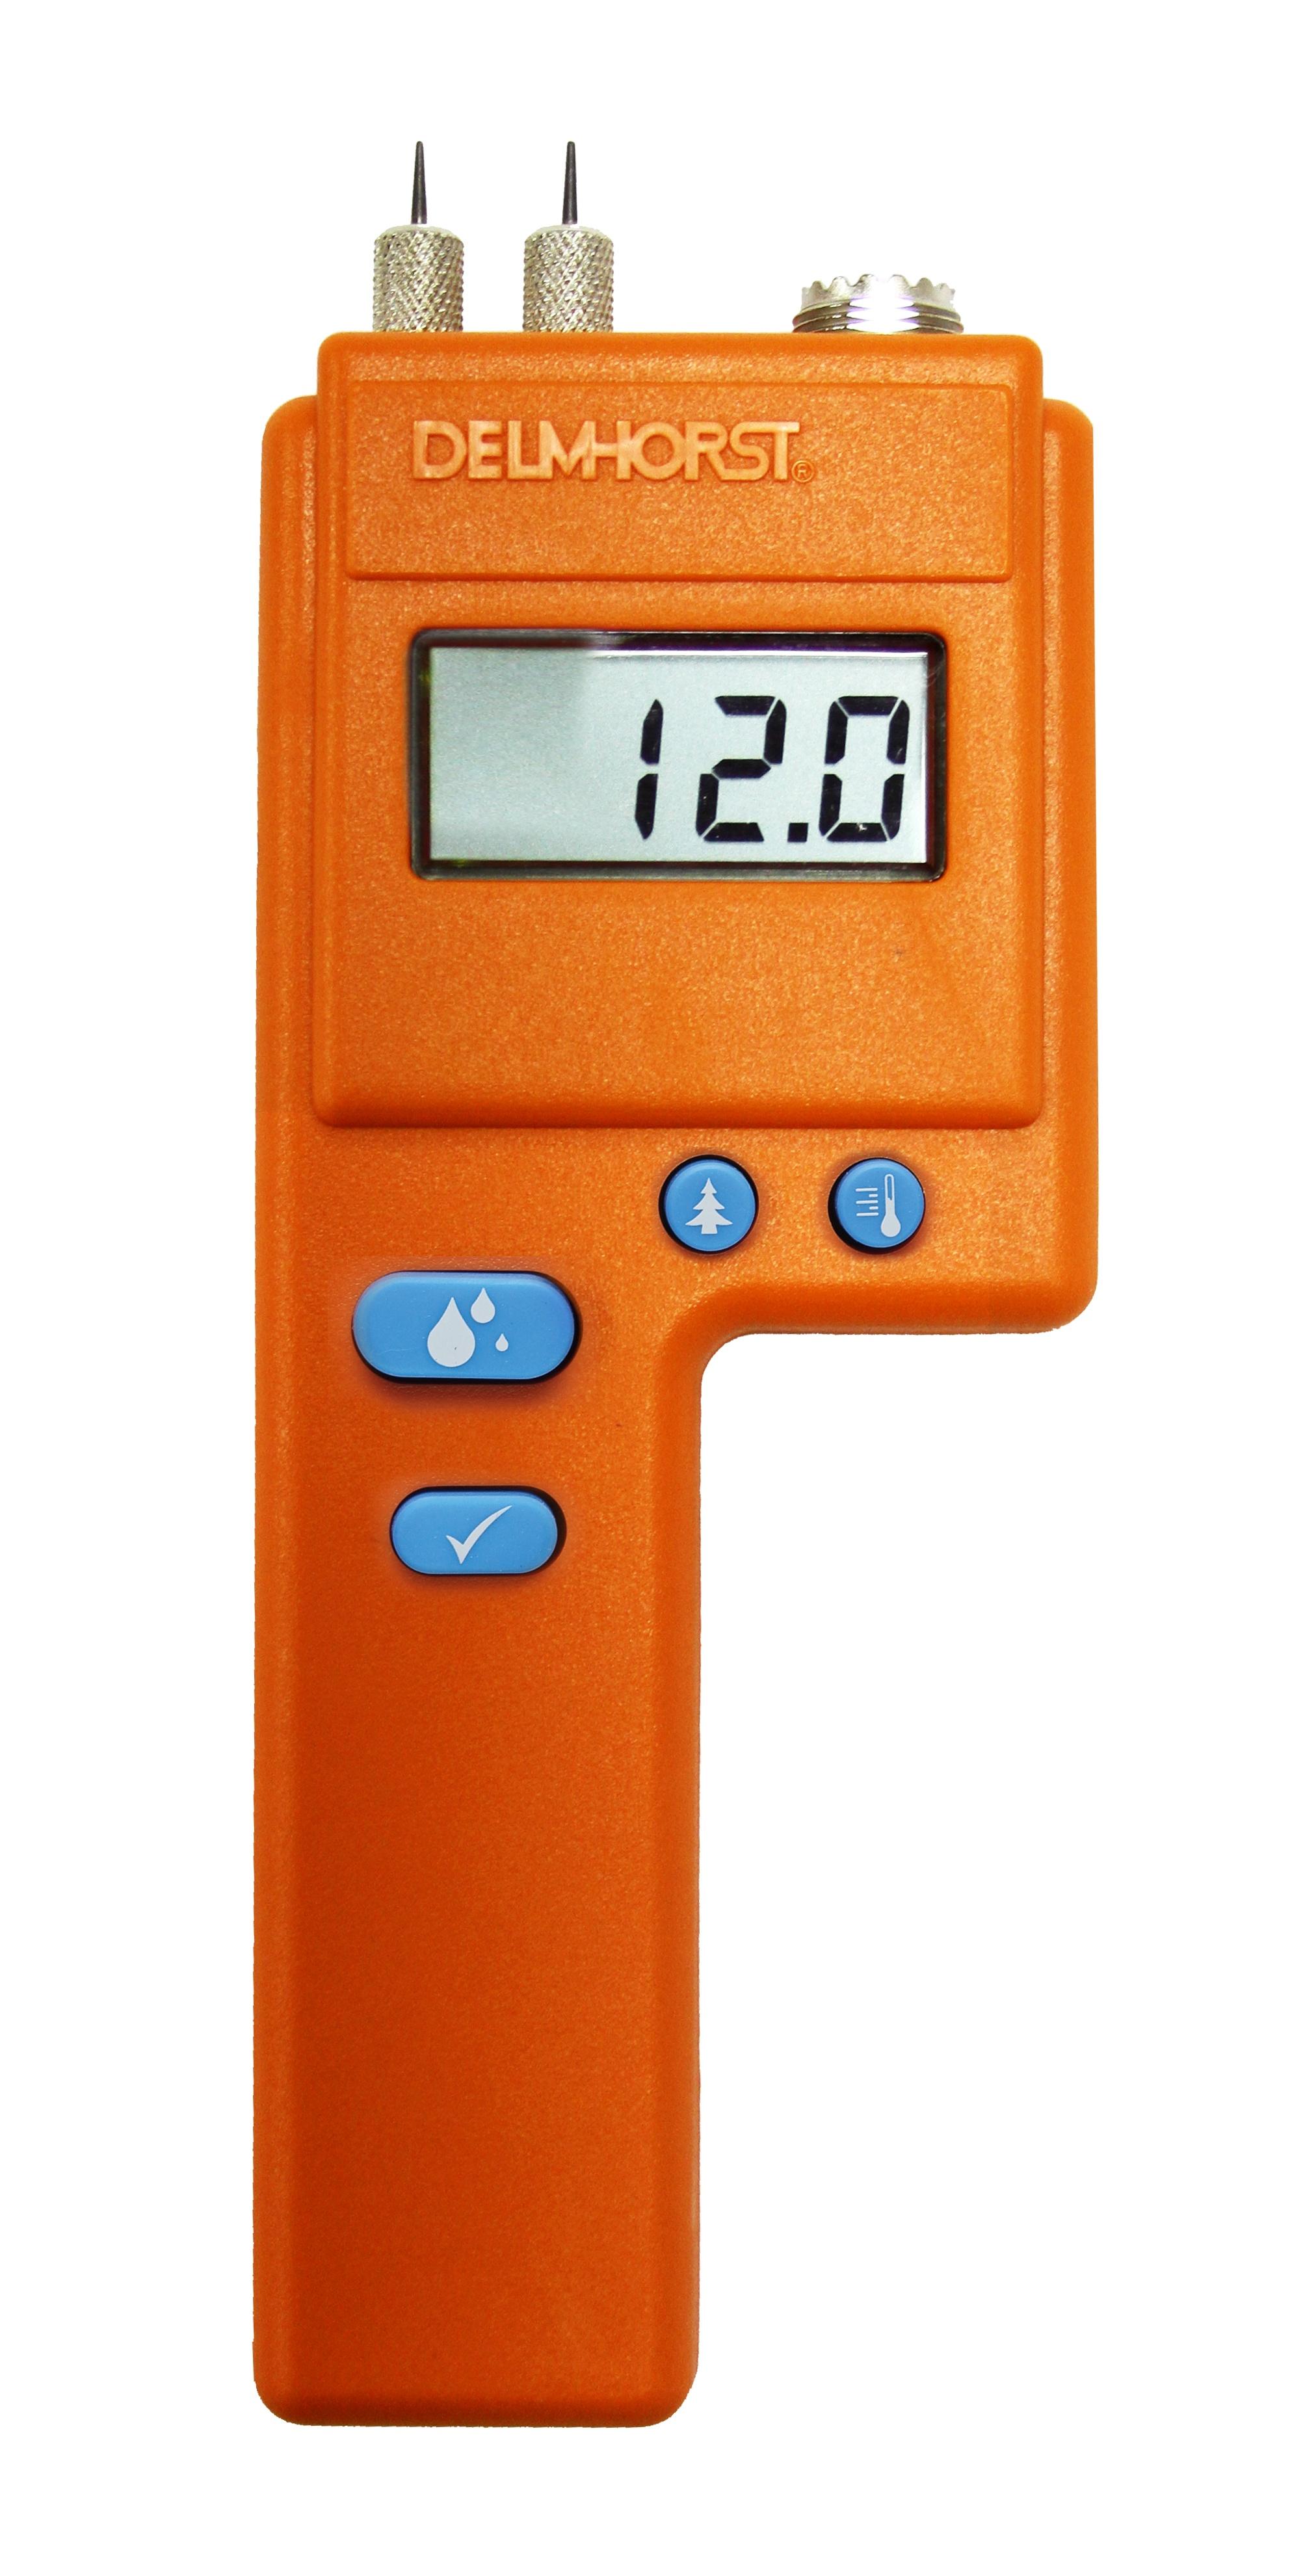 J-2000-1 Moisture Meter